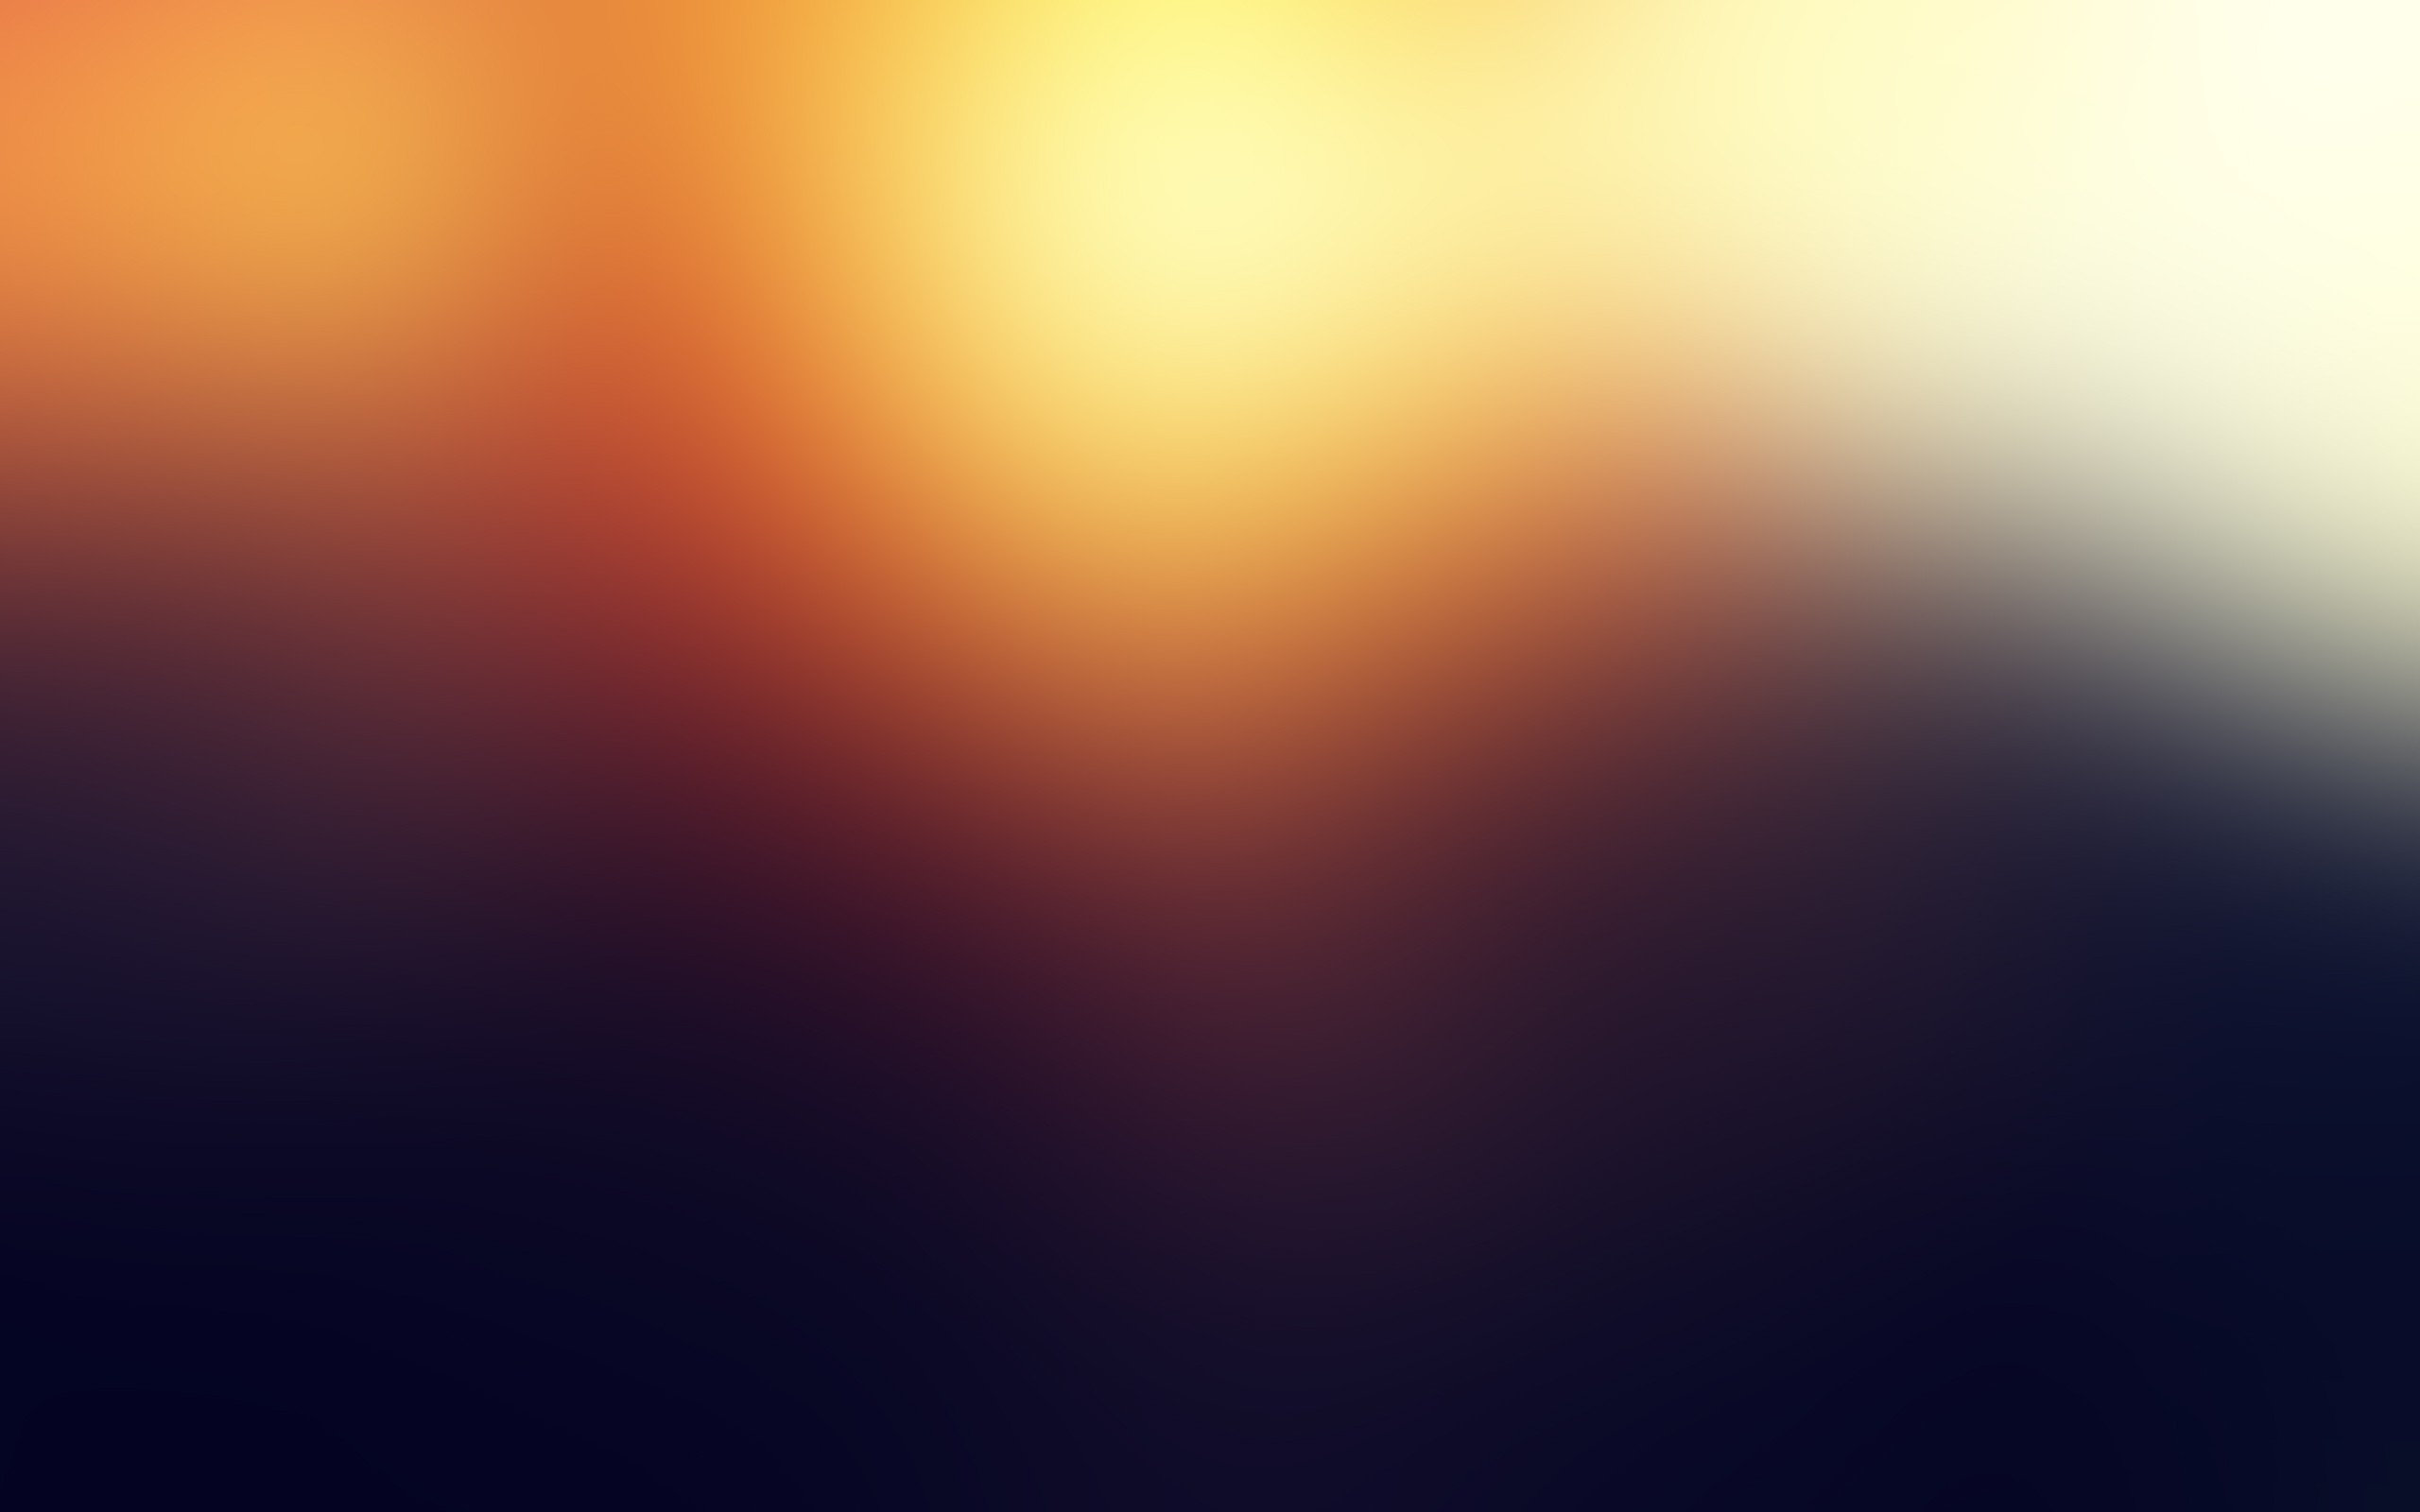 Hazy wallpaper 2560x1600 74124 2560x1600